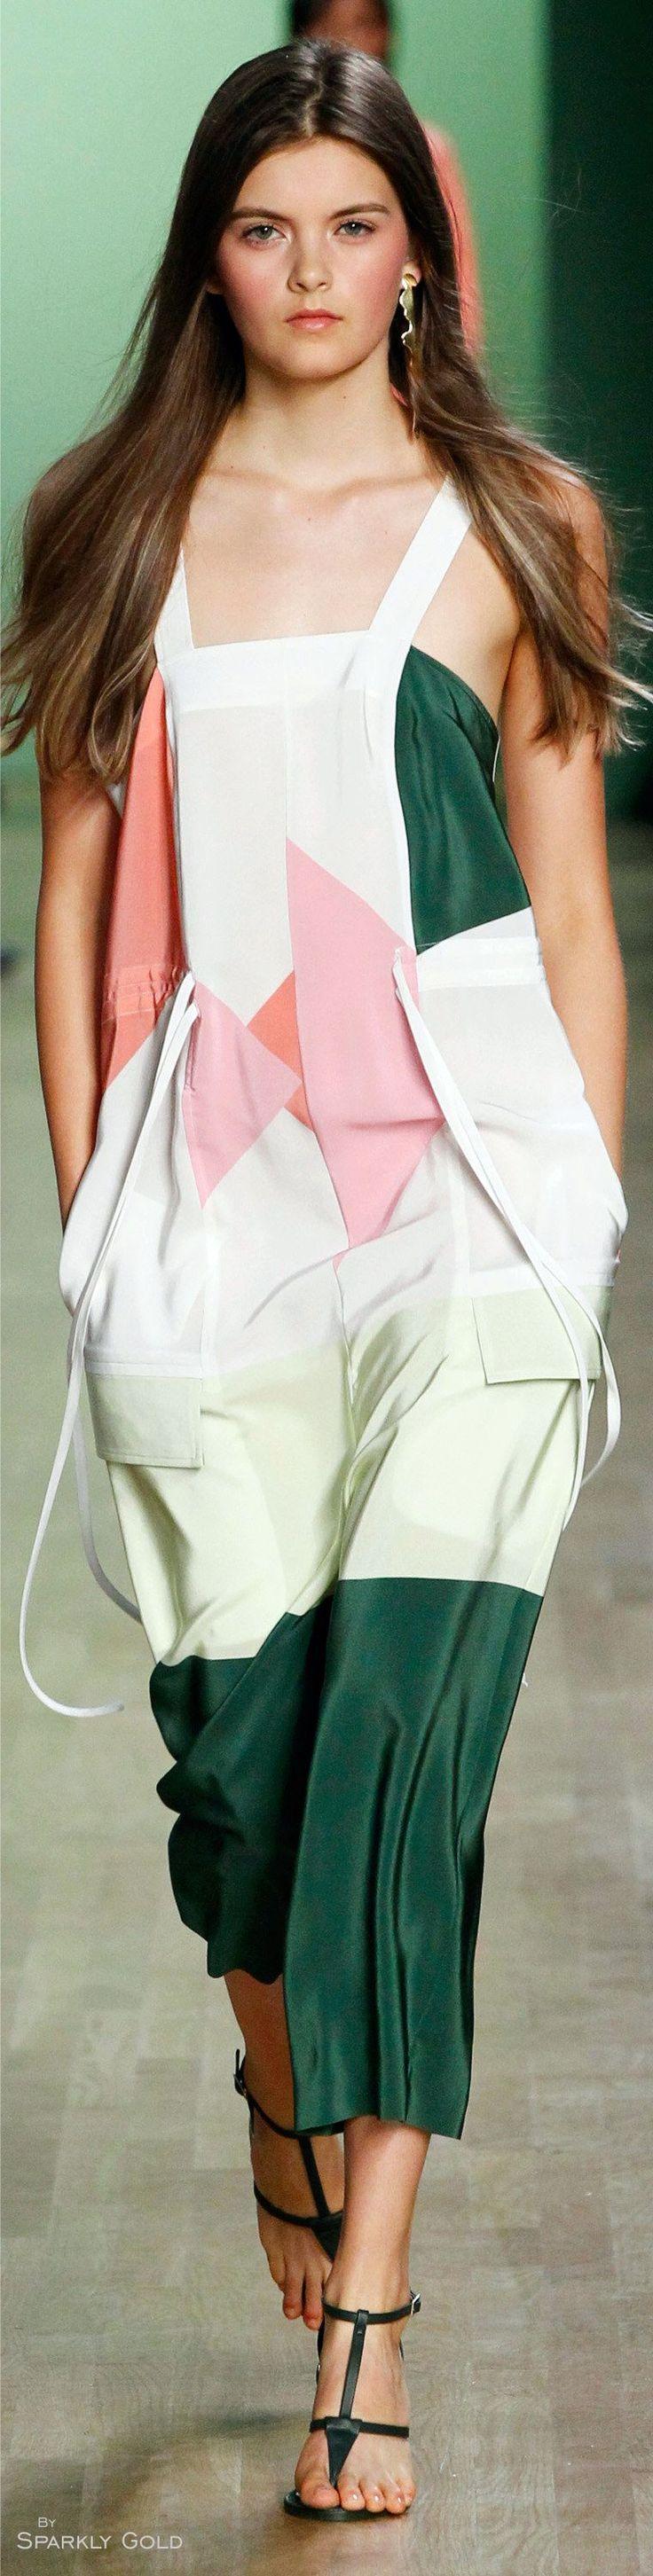 Tibi Spring 2016 RTW women fashion outfit clothing style apparel @roressclothes closet ideas